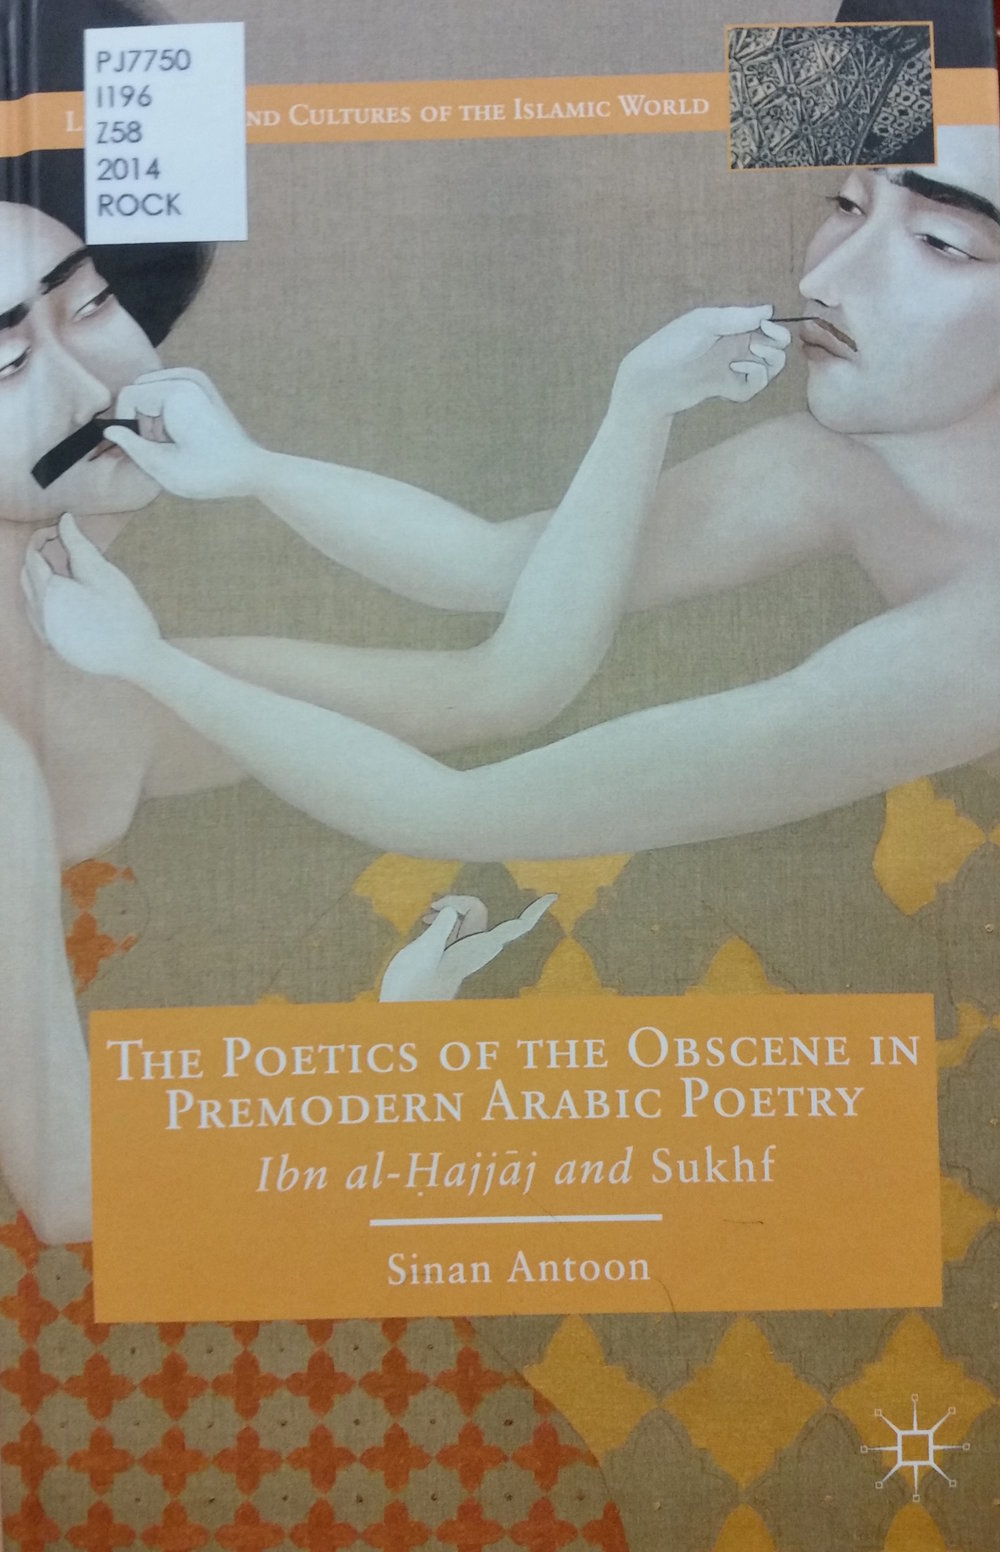 Sinan Antoon (New York : Palgrave Macmillan, 2014)